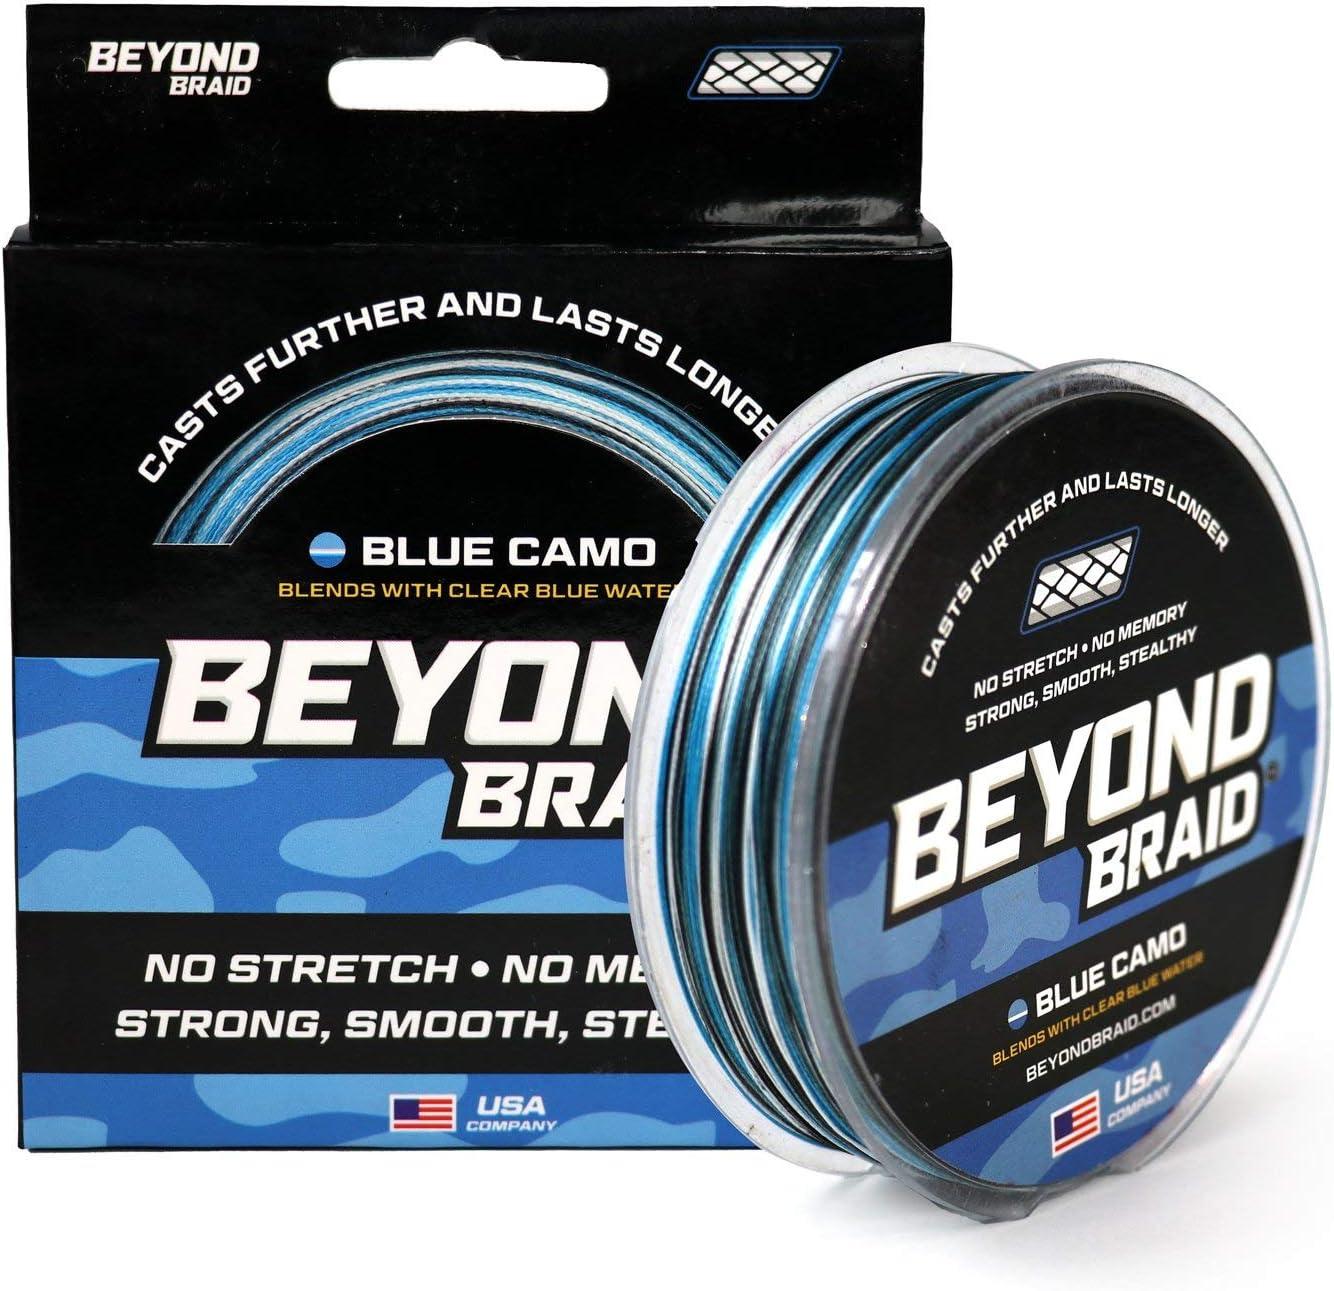 Beyond Braid Braided 1 year warranty Charlotte Mall Fishing Line Resistant - Stre No Abrasion